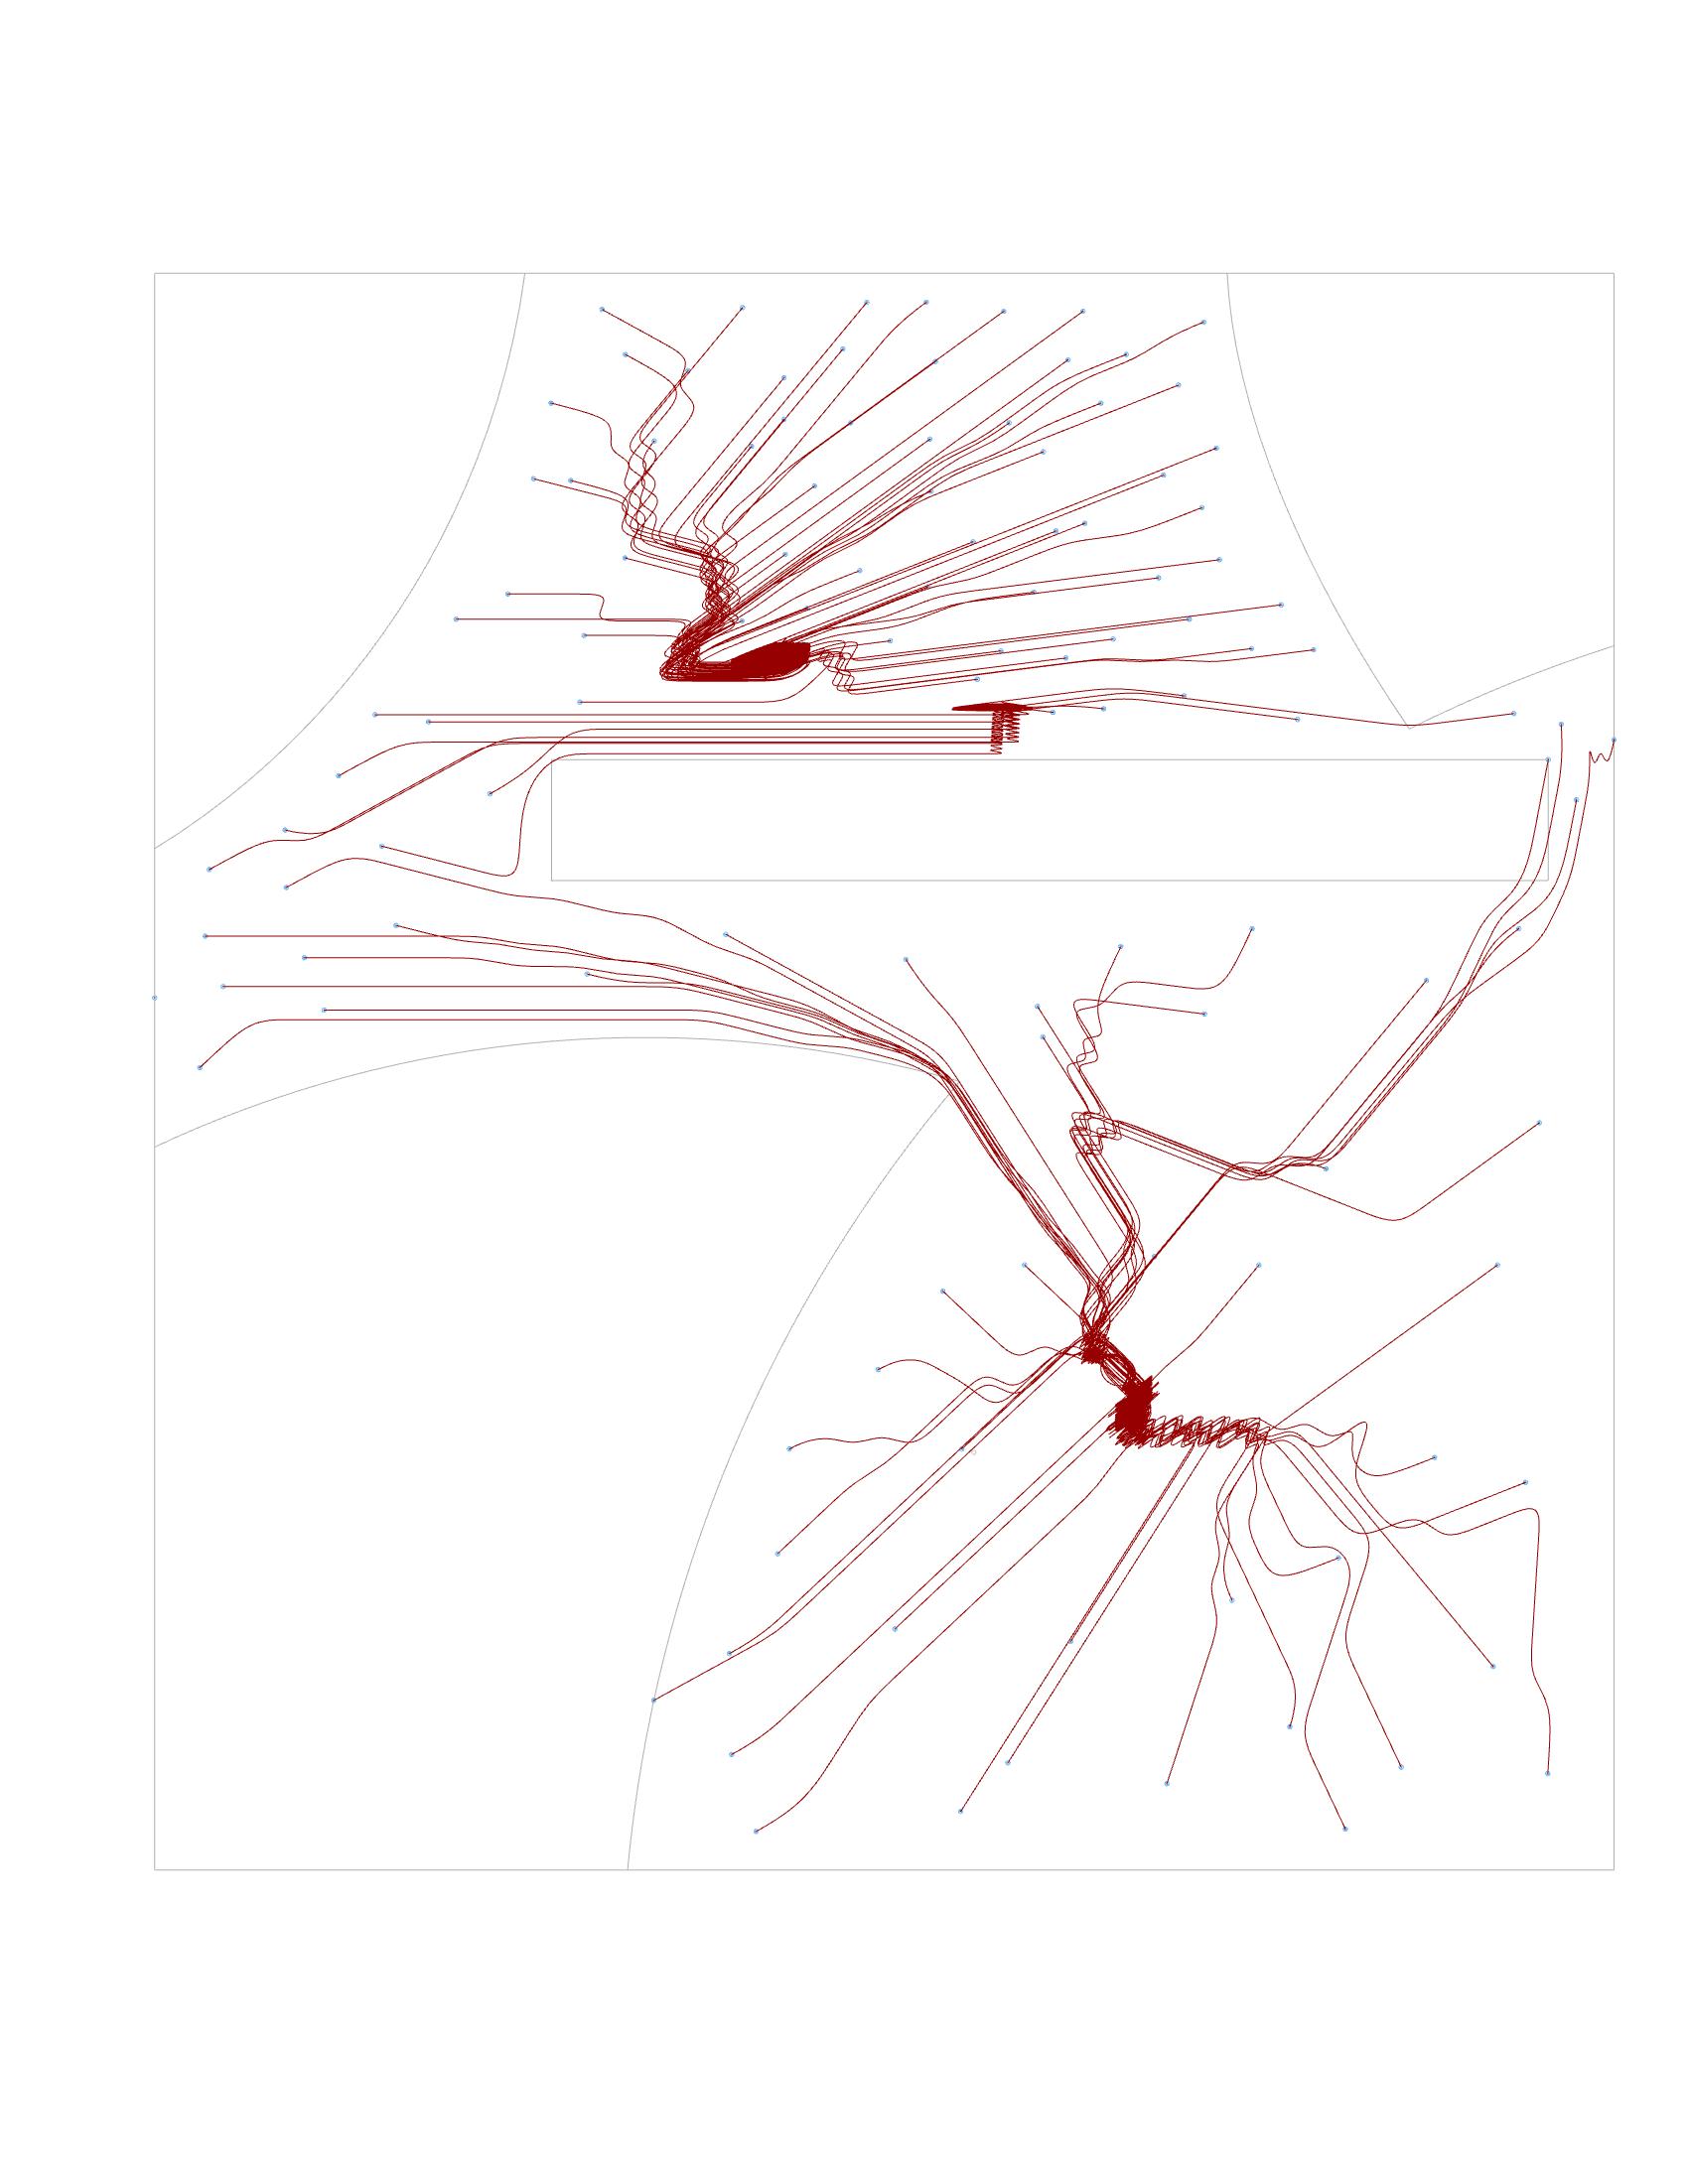 New Spm Grasshopper Component Vector Field Integration